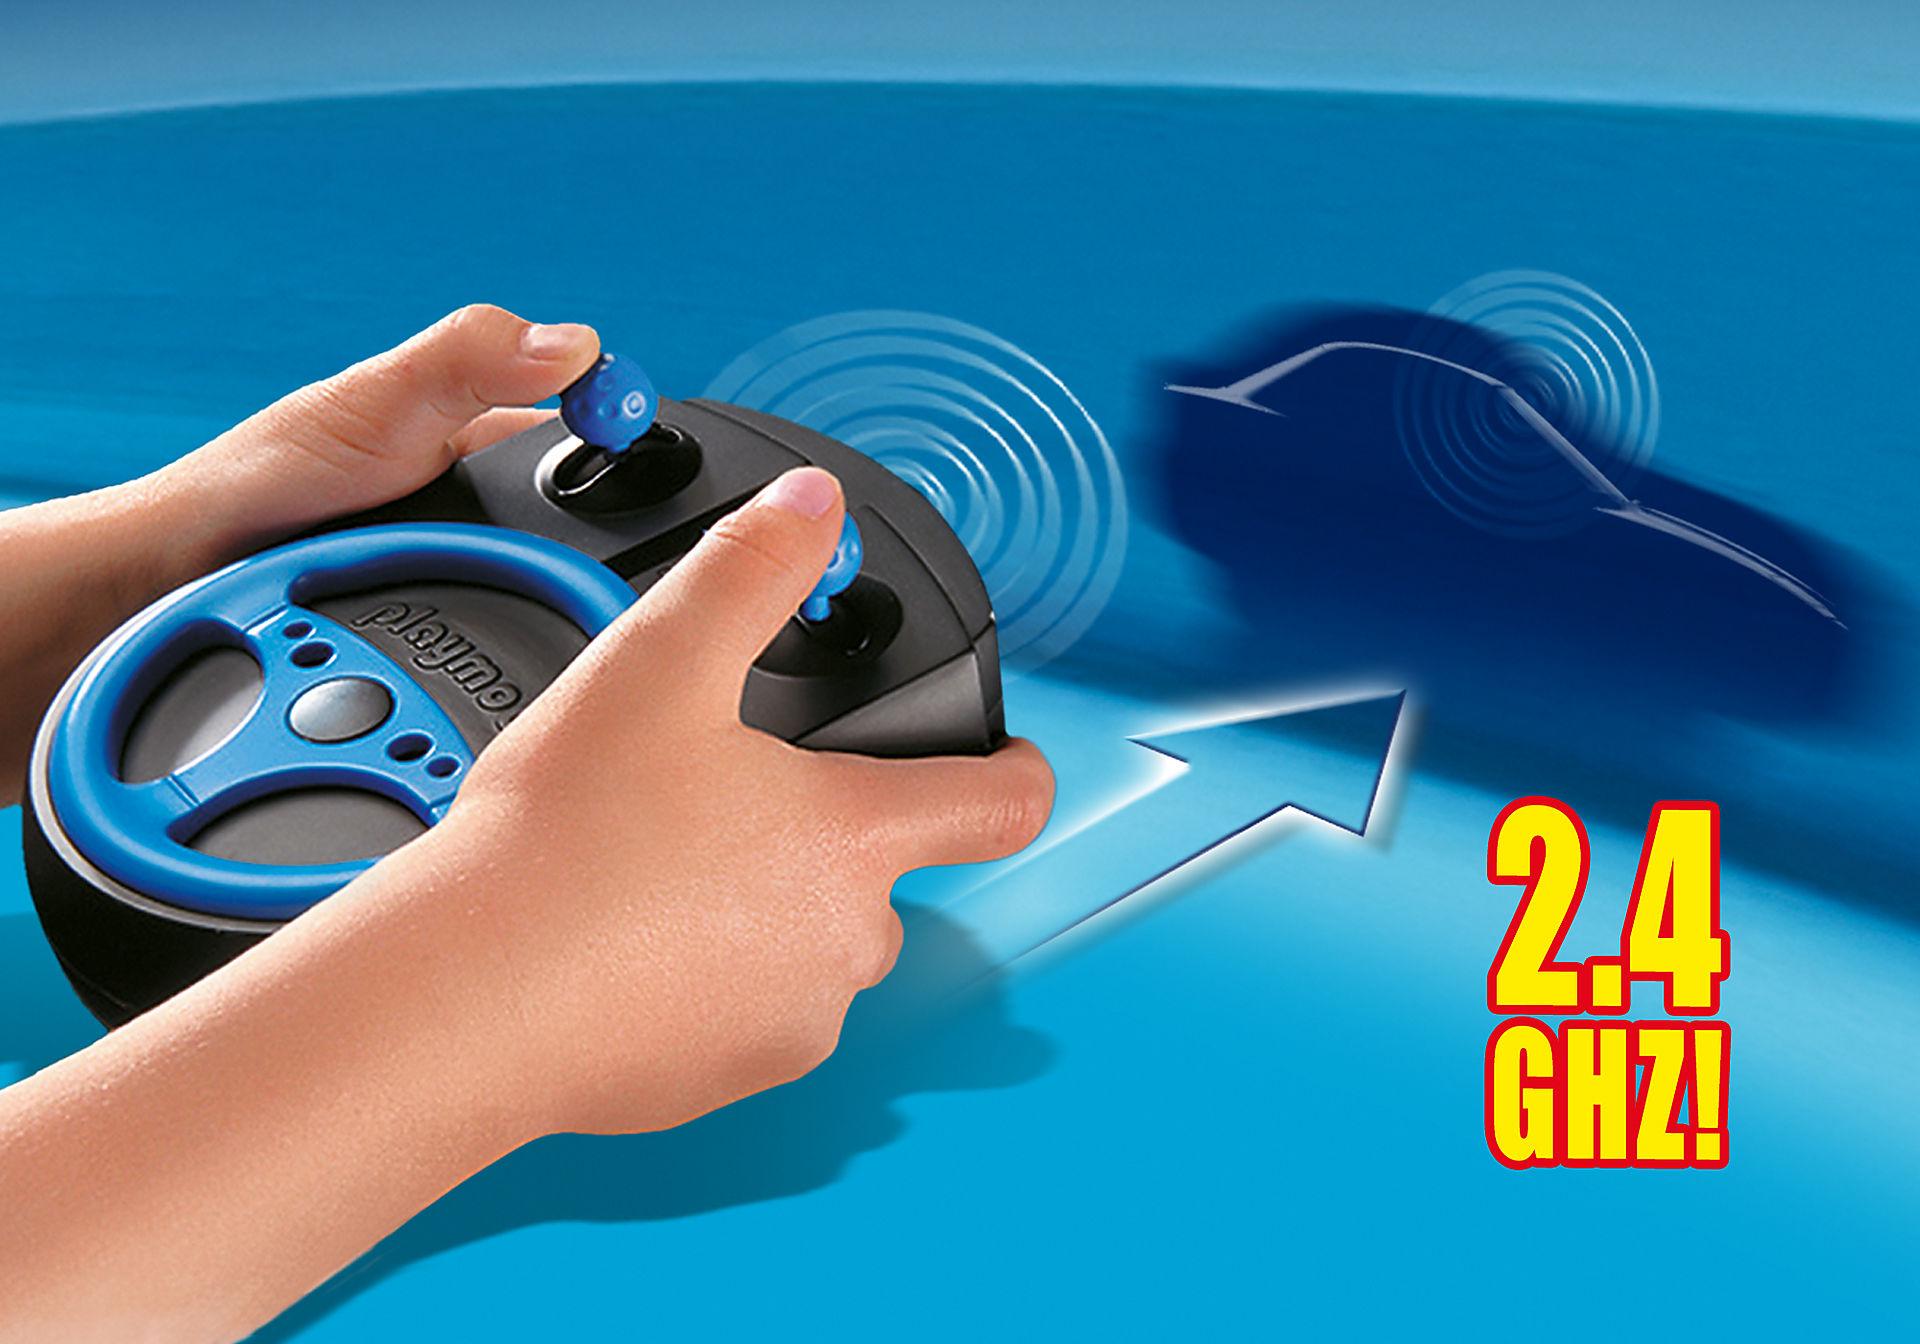 http://media.playmobil.com/i/playmobil/6914_product_extra2/RC Σετ Τηλεκατεύθυνσης